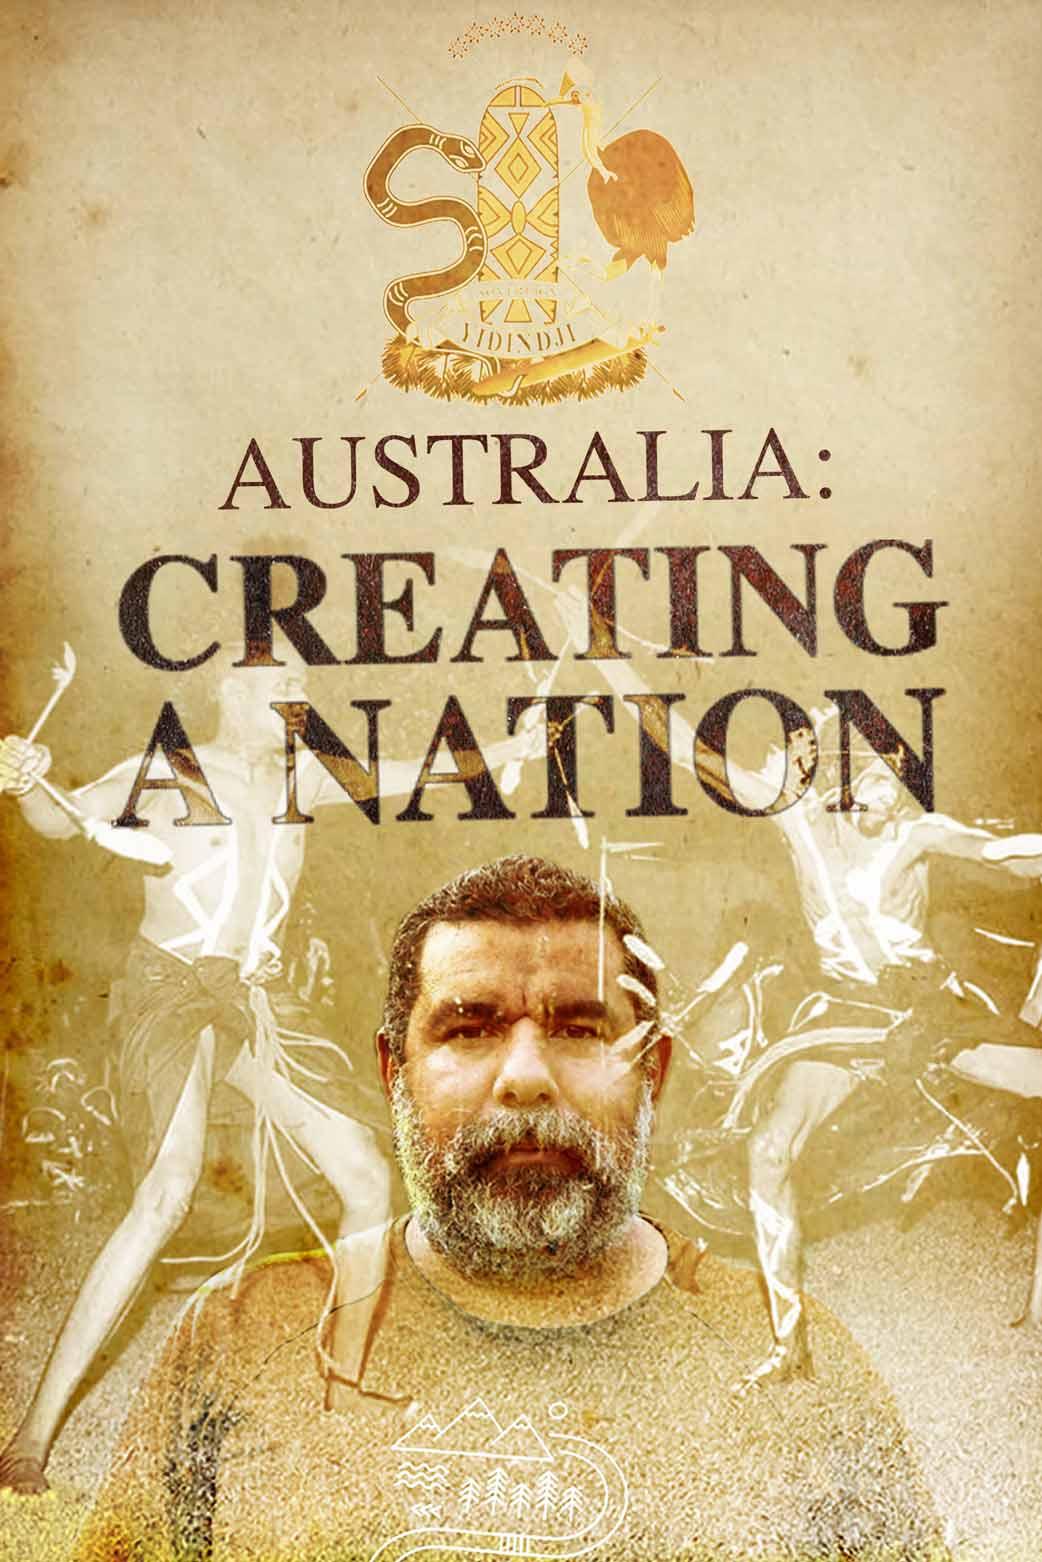 Australia: Creating a Nation